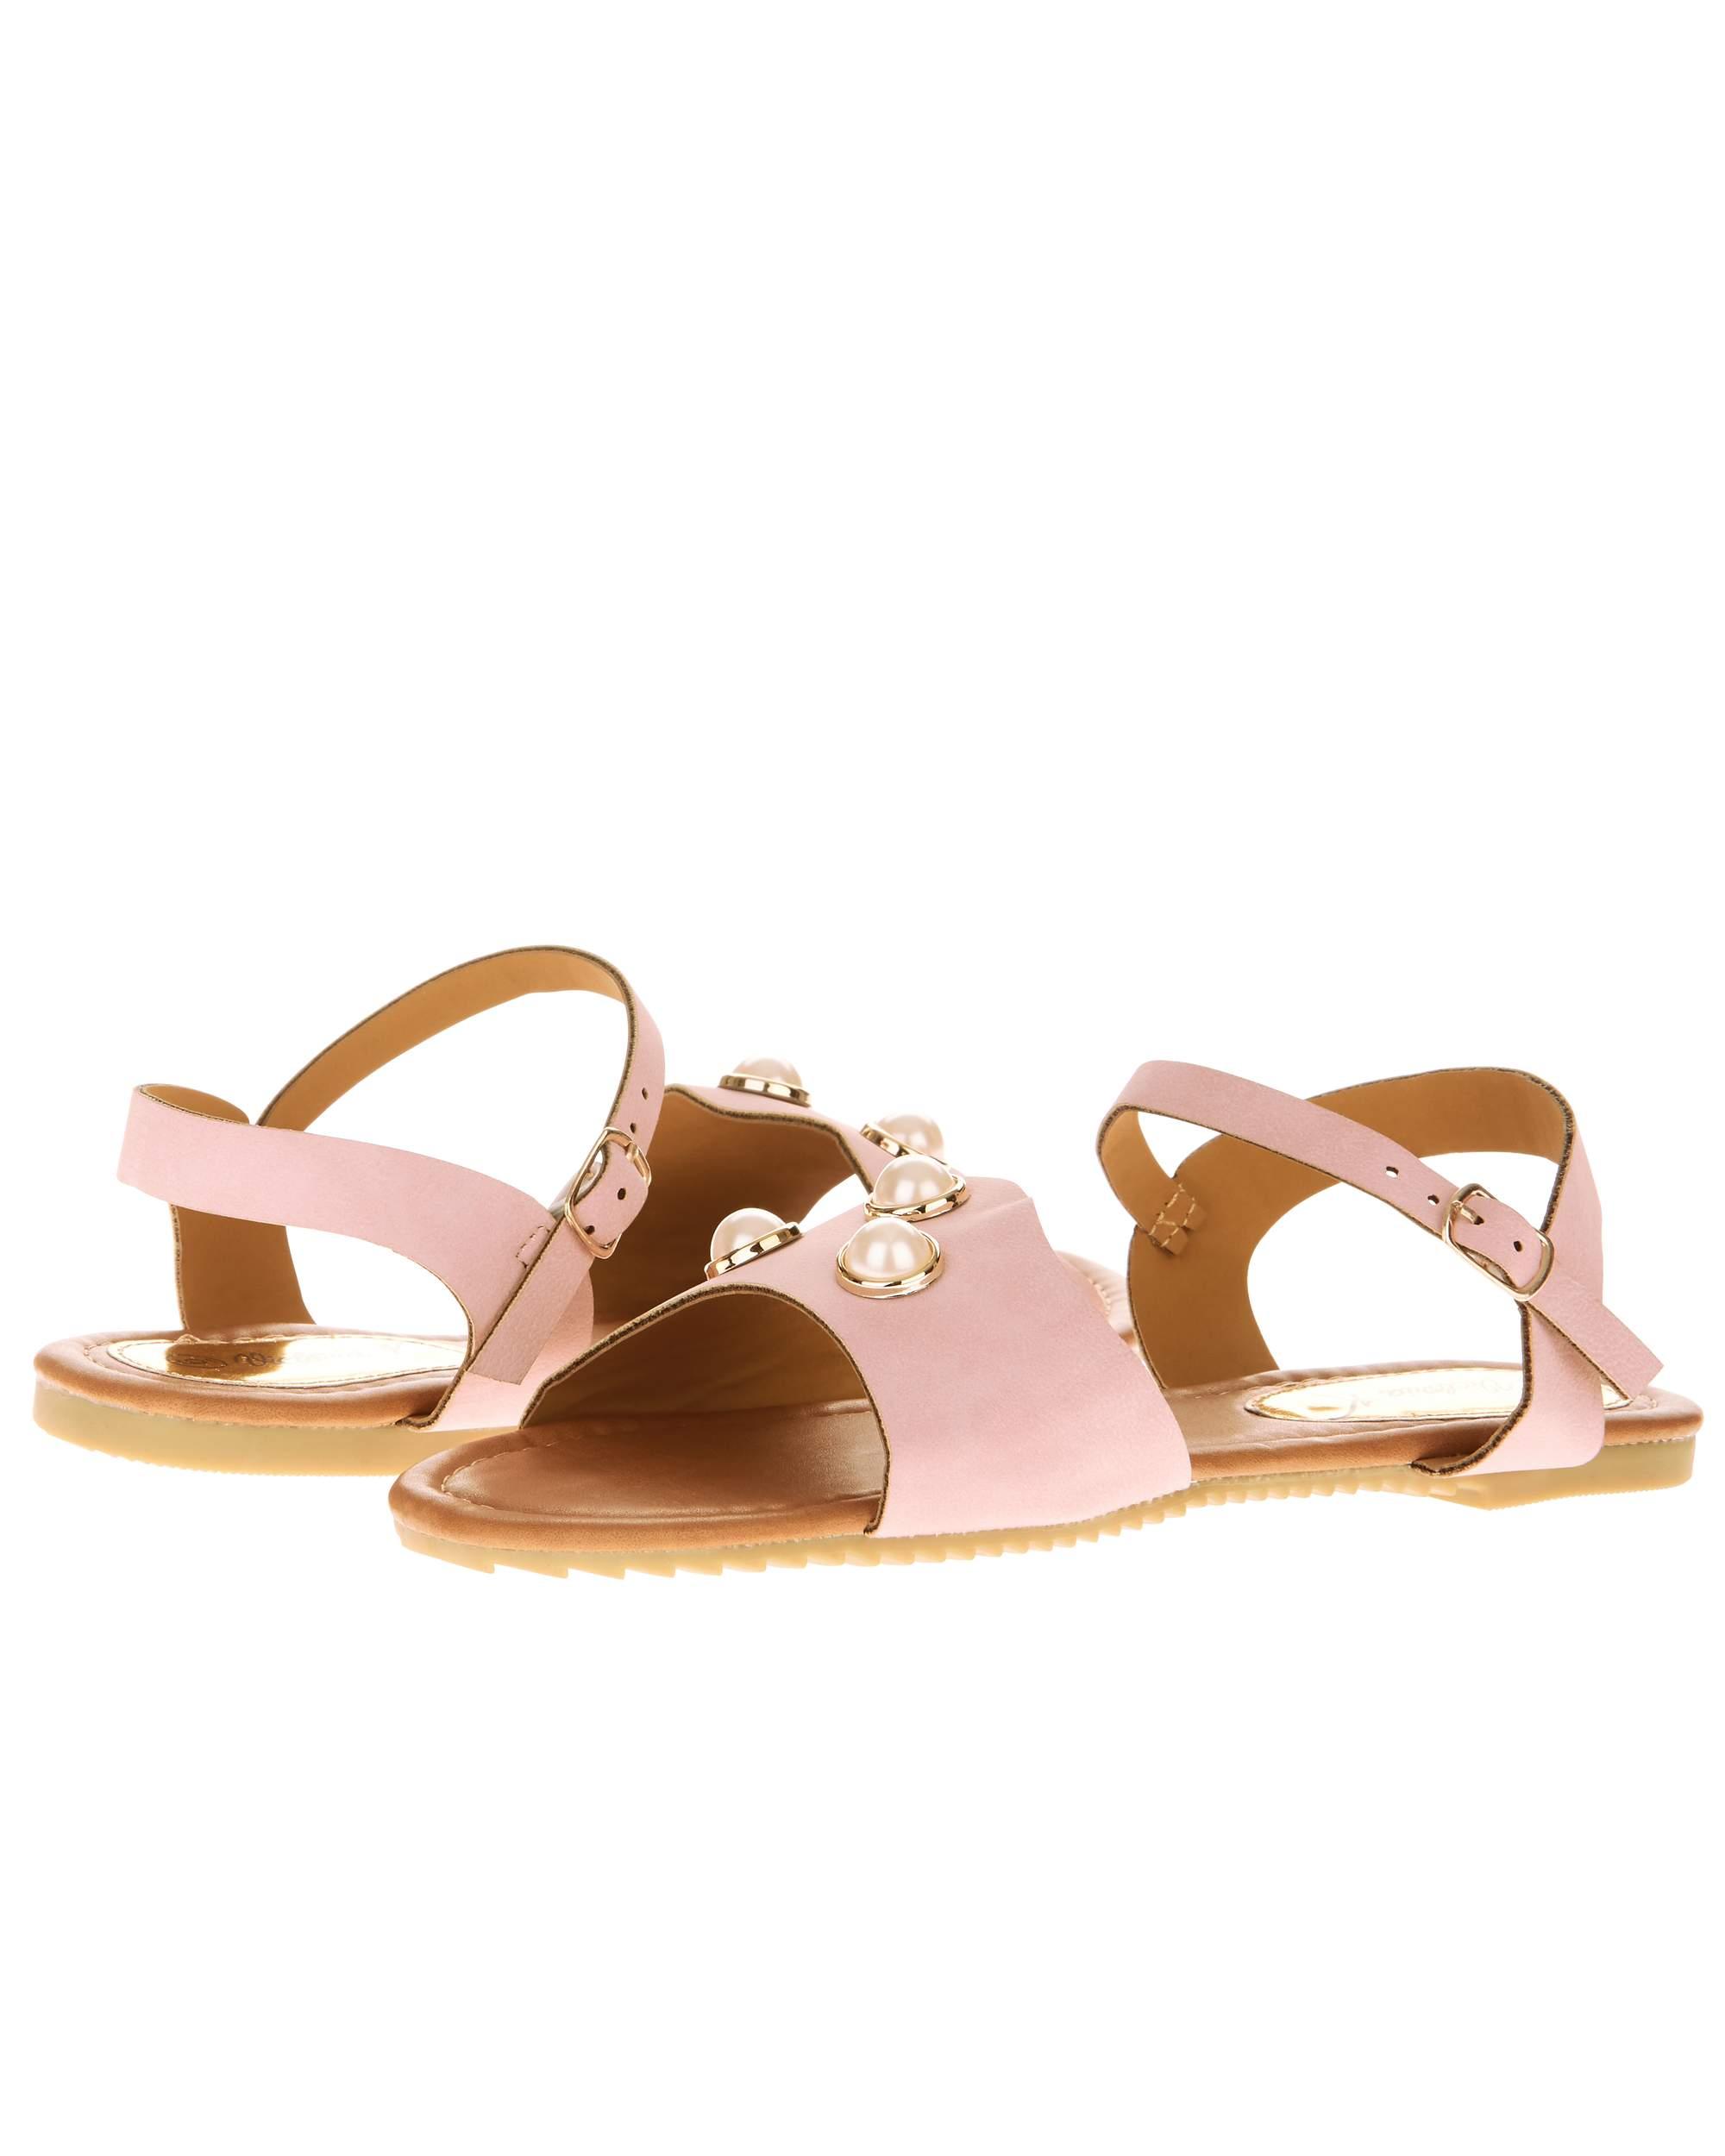 Victoria K Women's Three Pearls Sandals